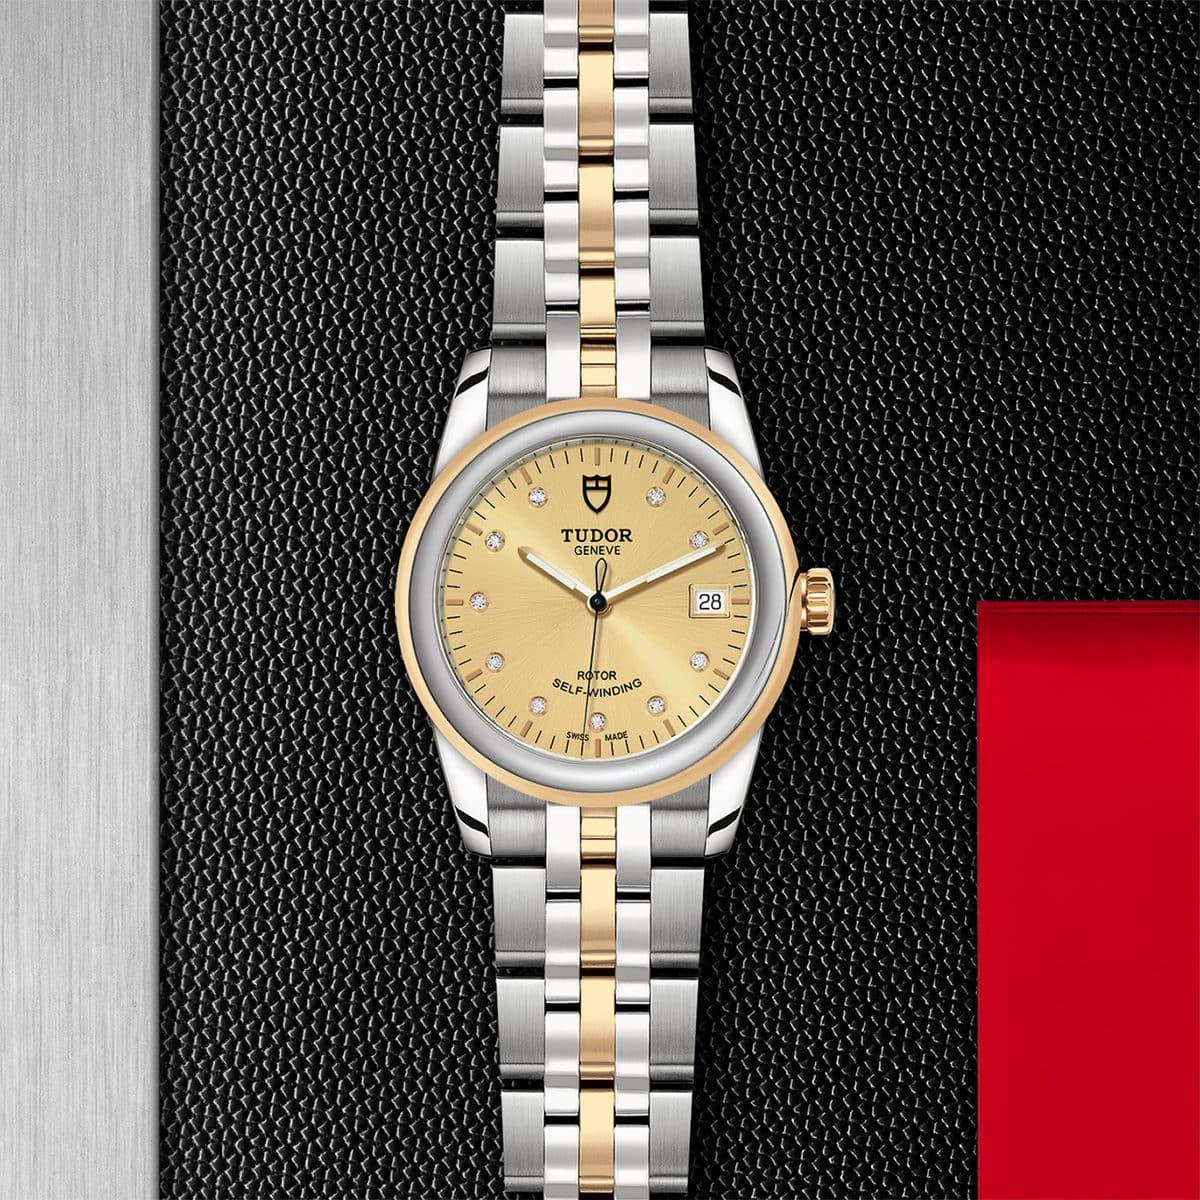 Tudor Glamour Date M55003-0006